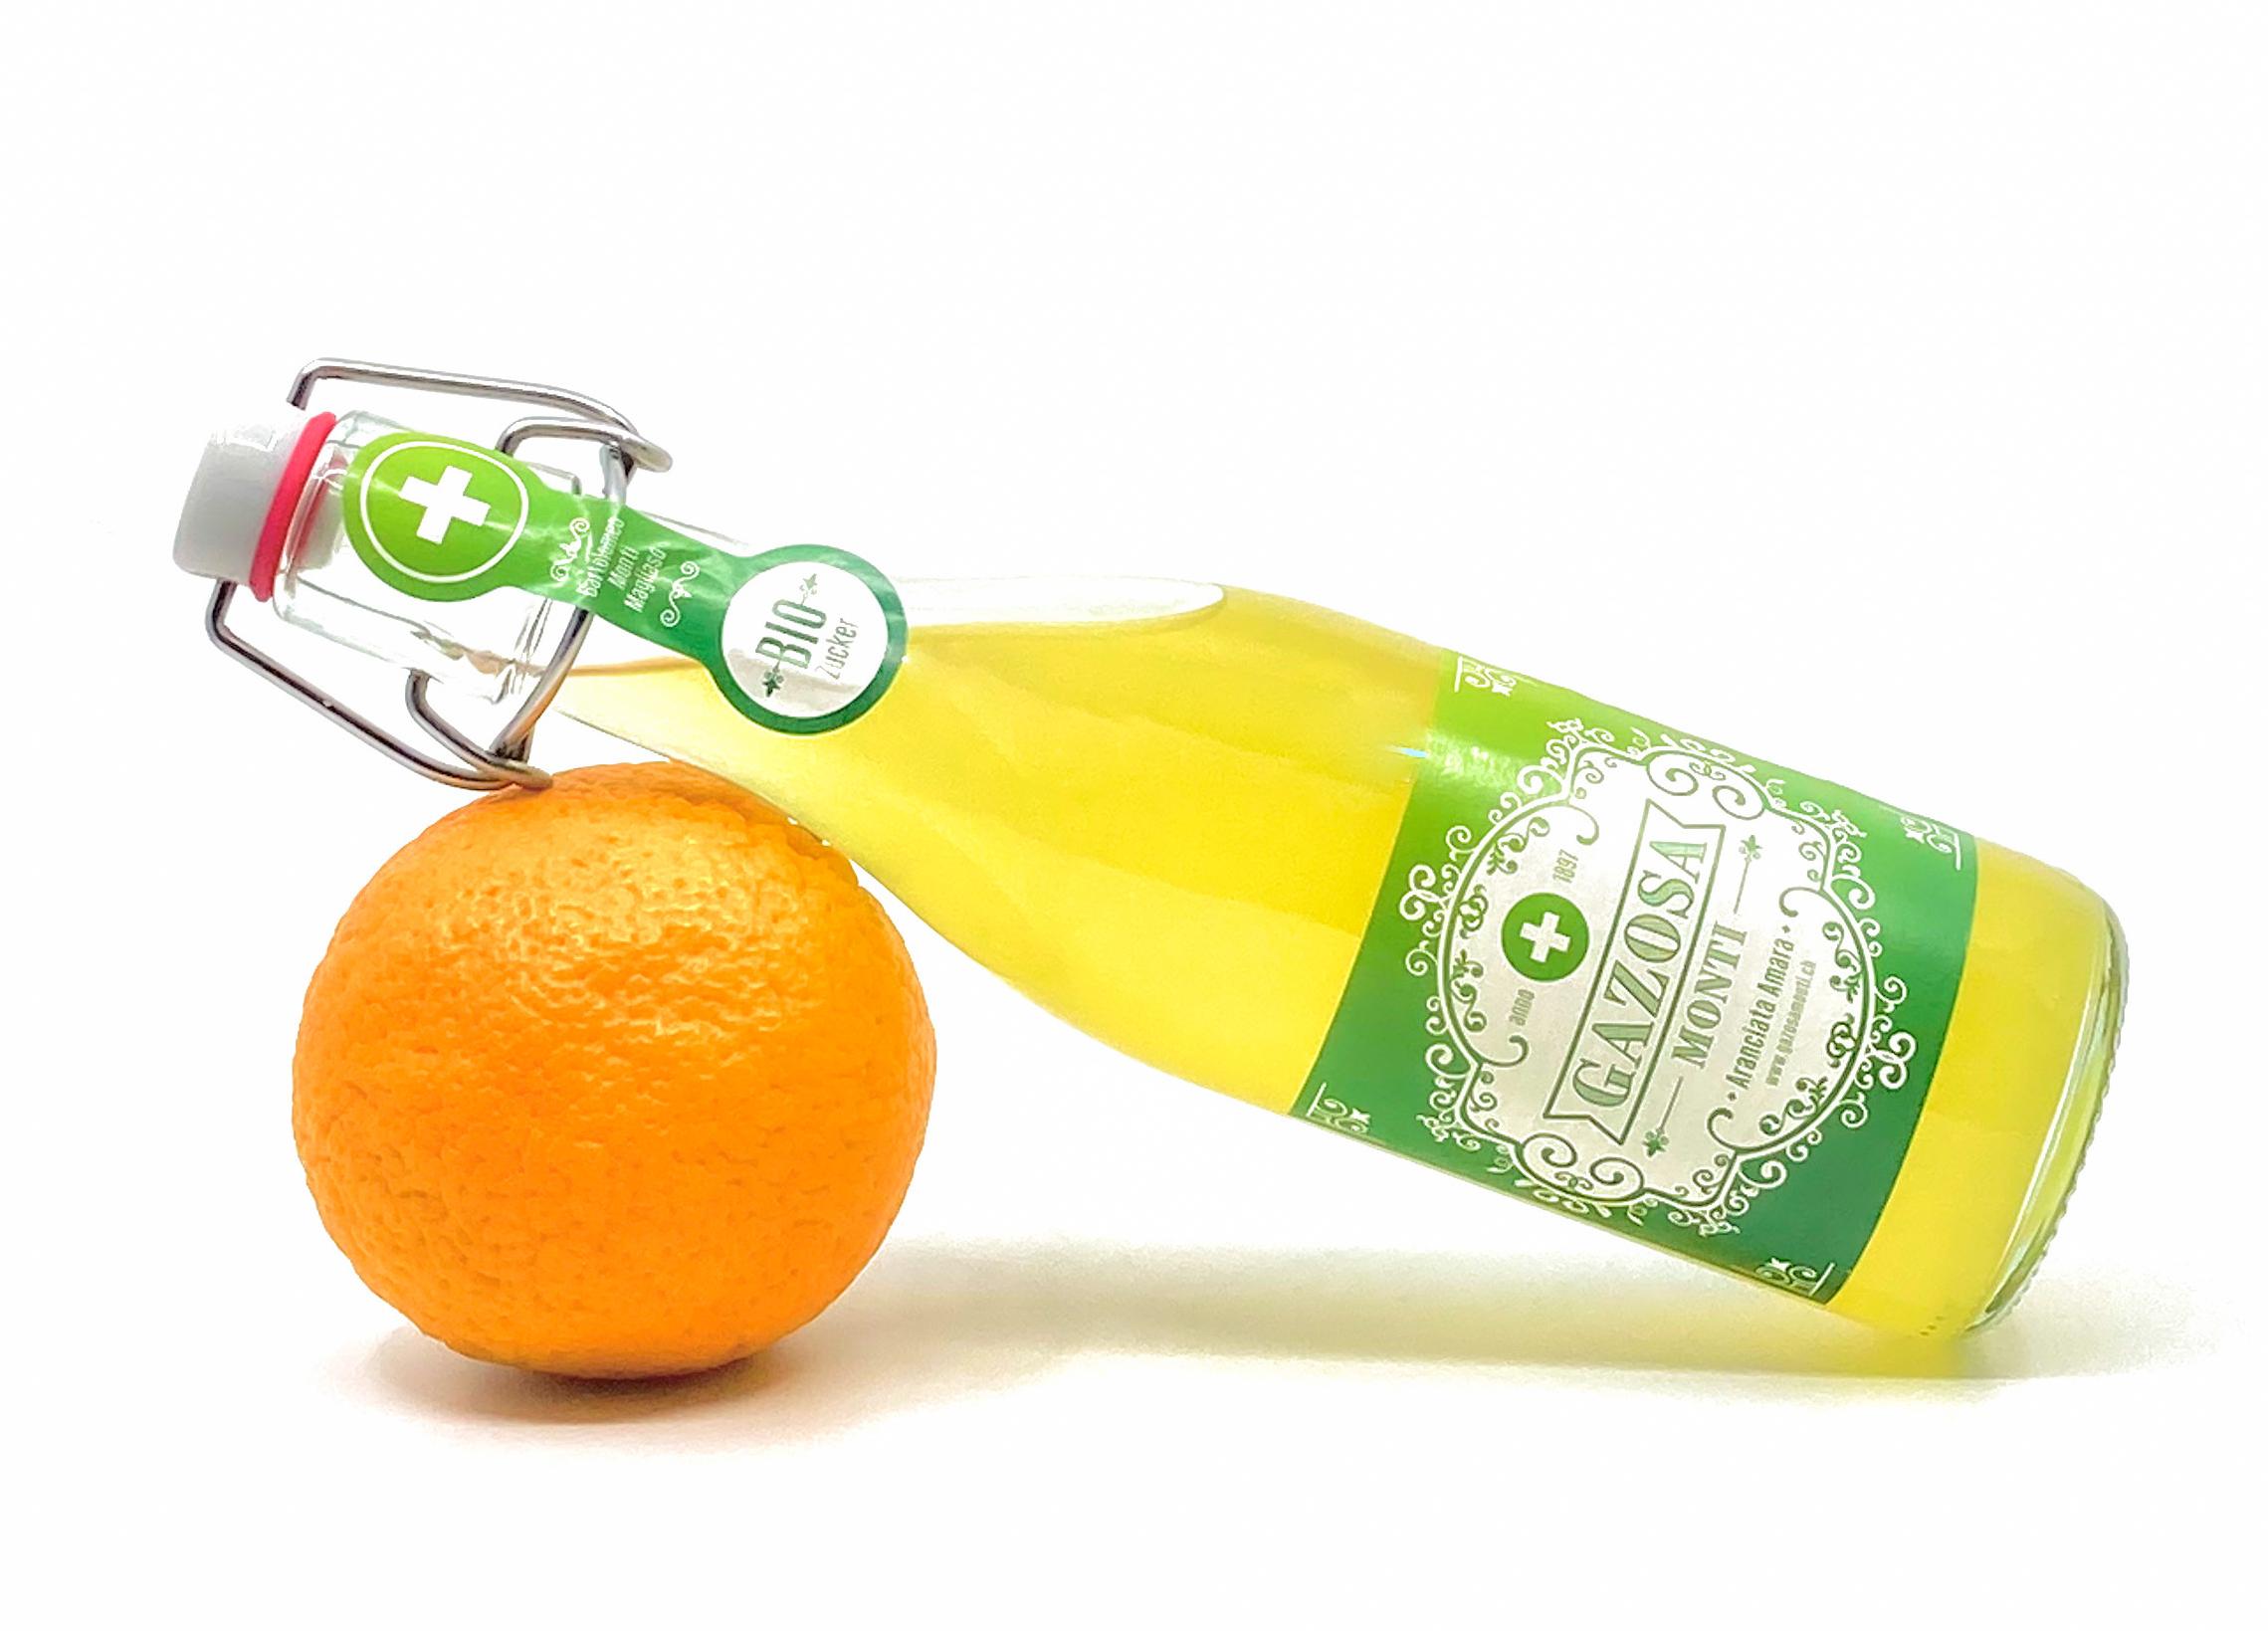 gazosa monti orange